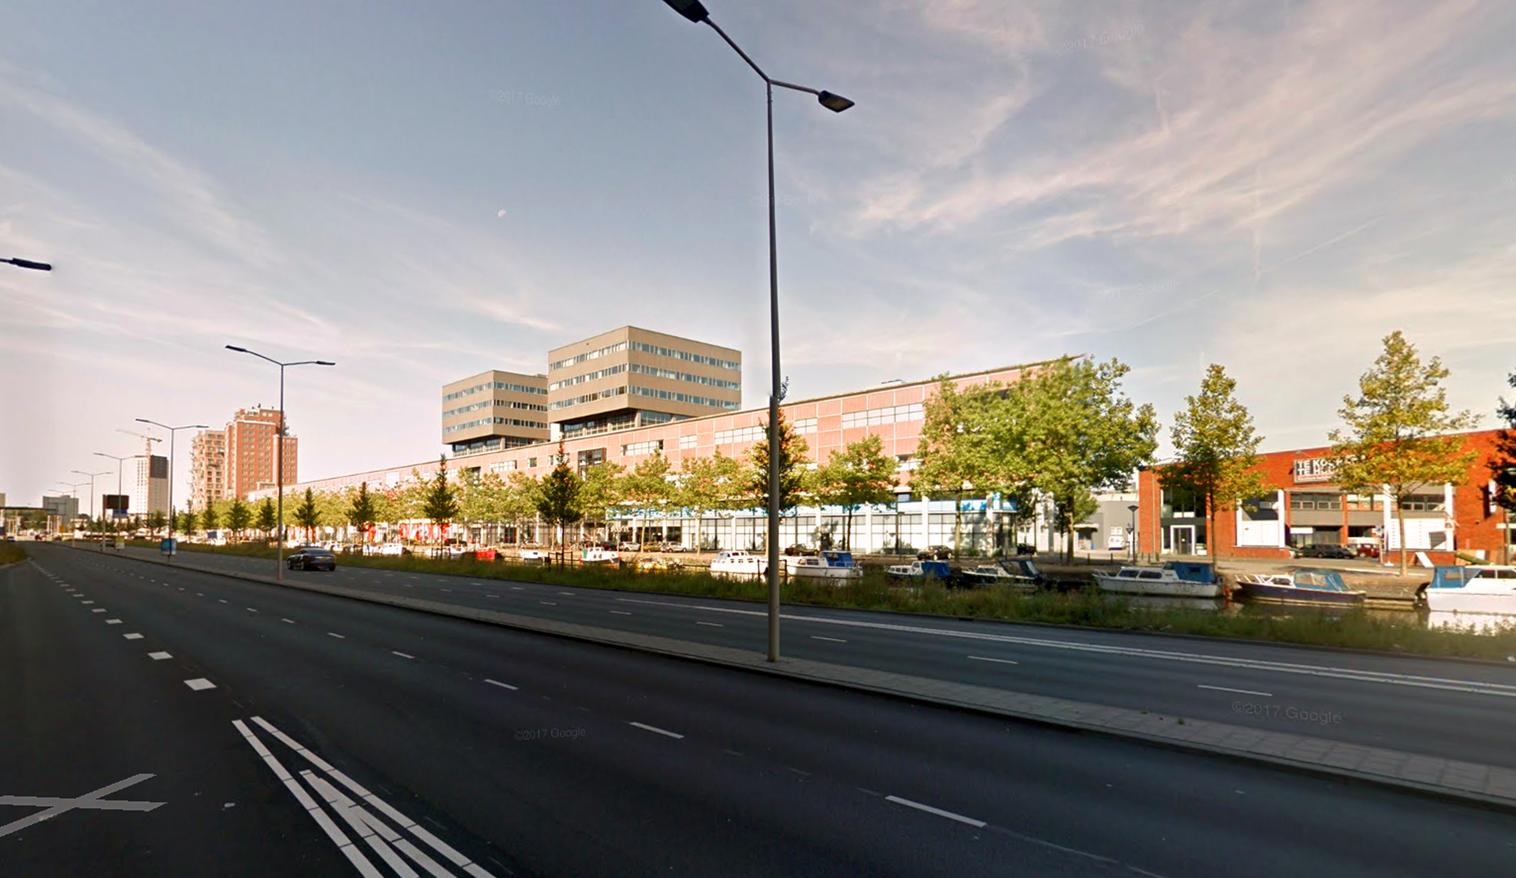 02 OPL Architecten_Verheeskade DenHaag-1516×878-72dpi